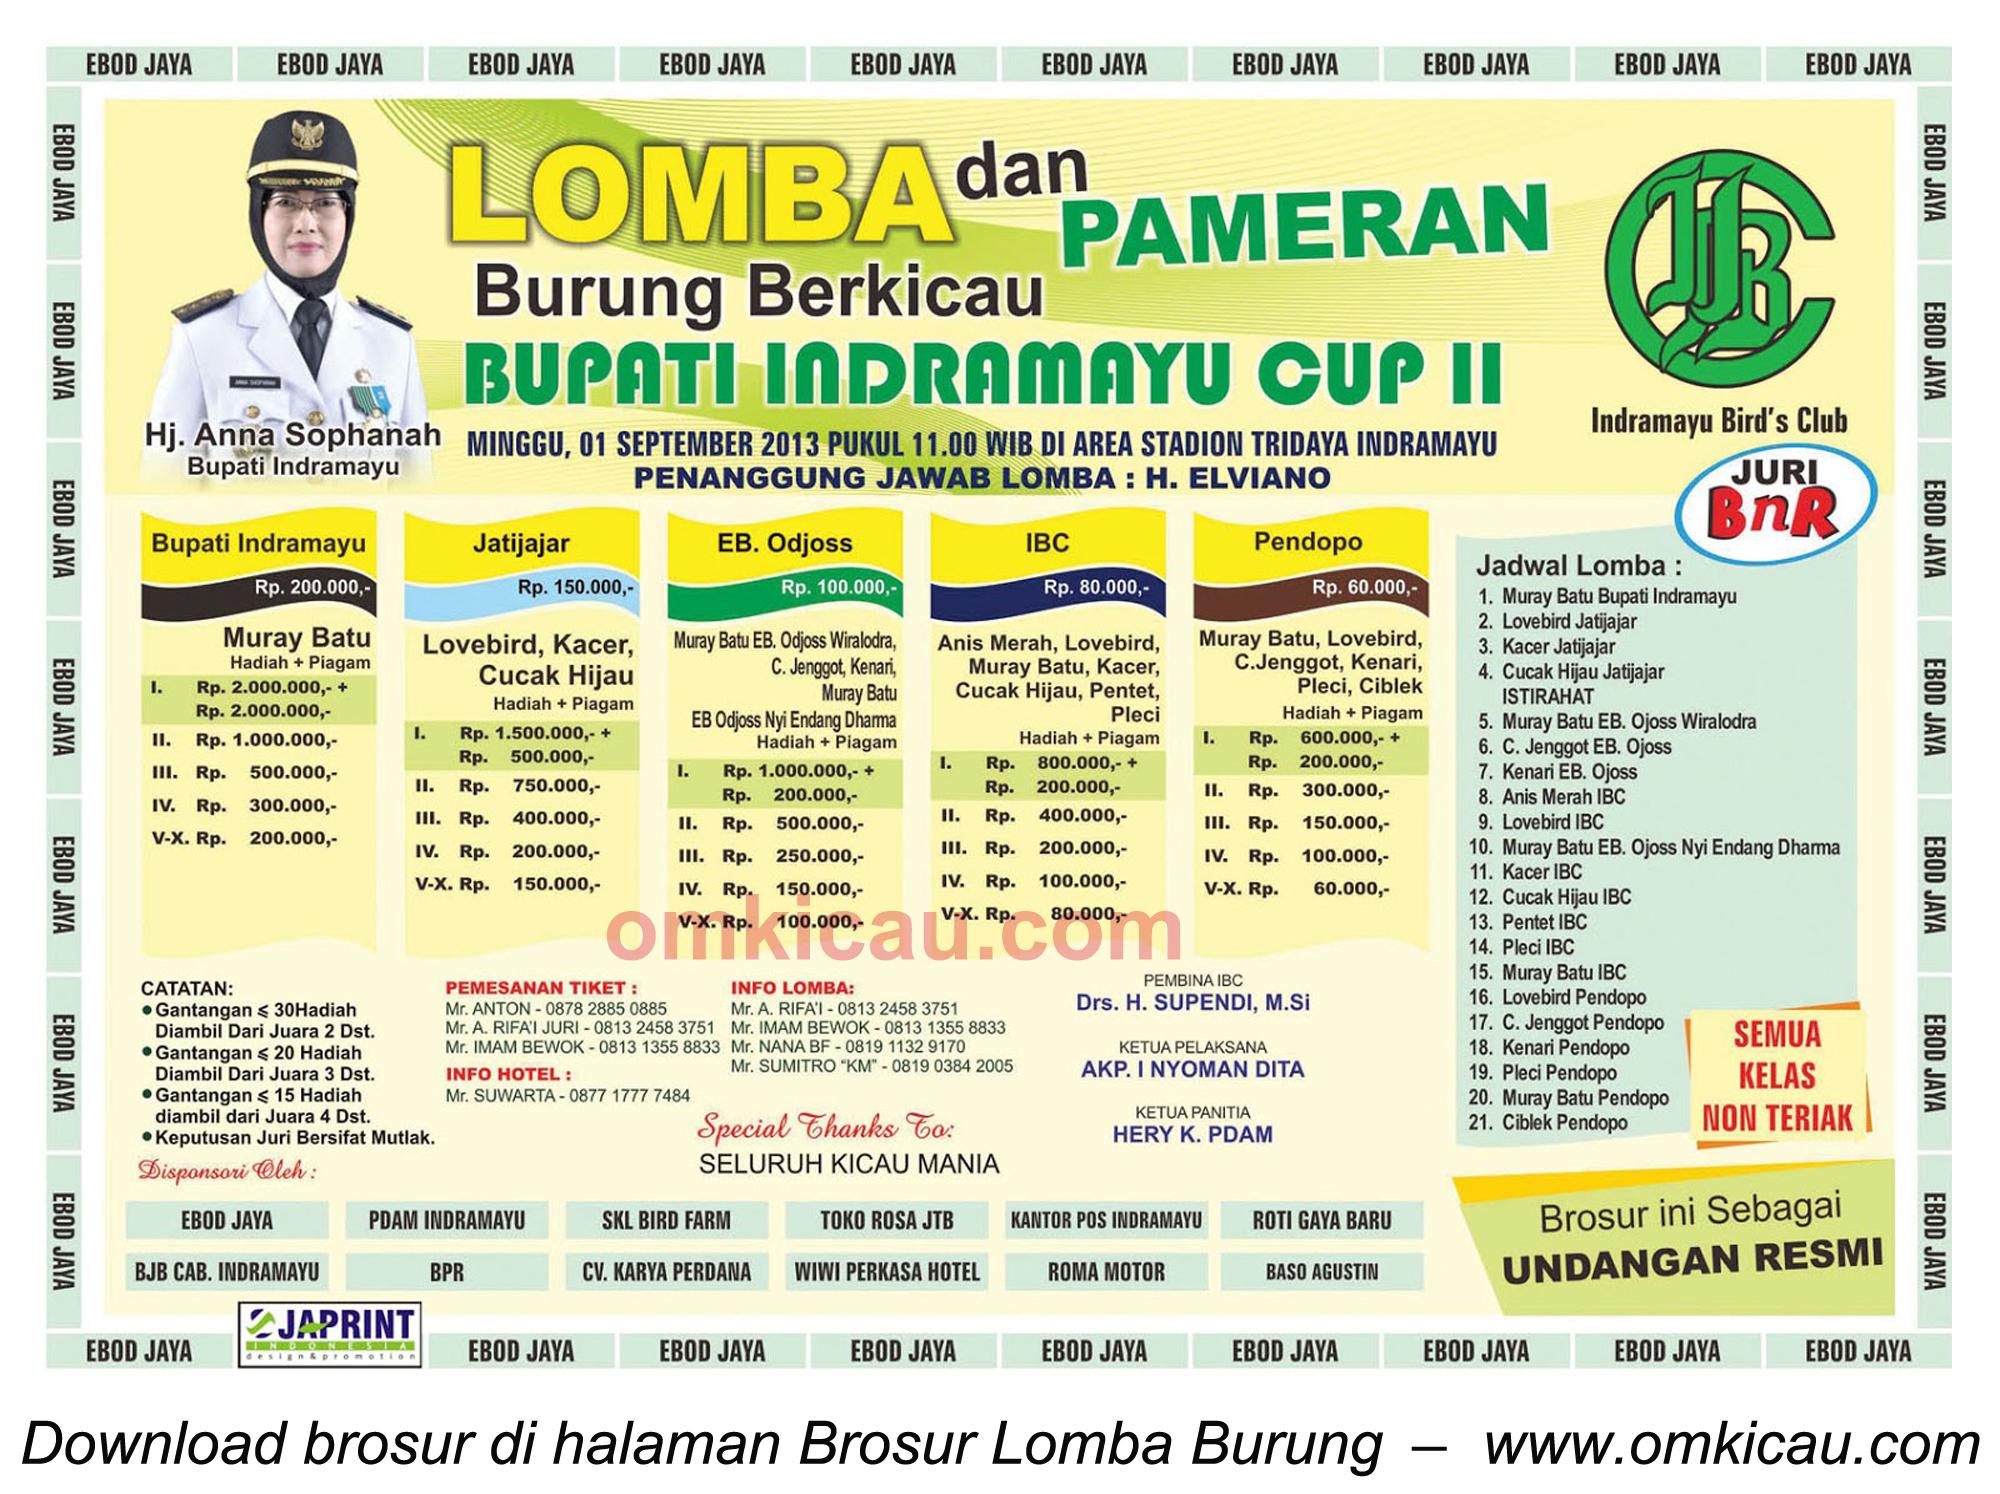 Brosur Lomba Burung Bupati Indramayu Cup II, Indramayu, 1 Sept 2013